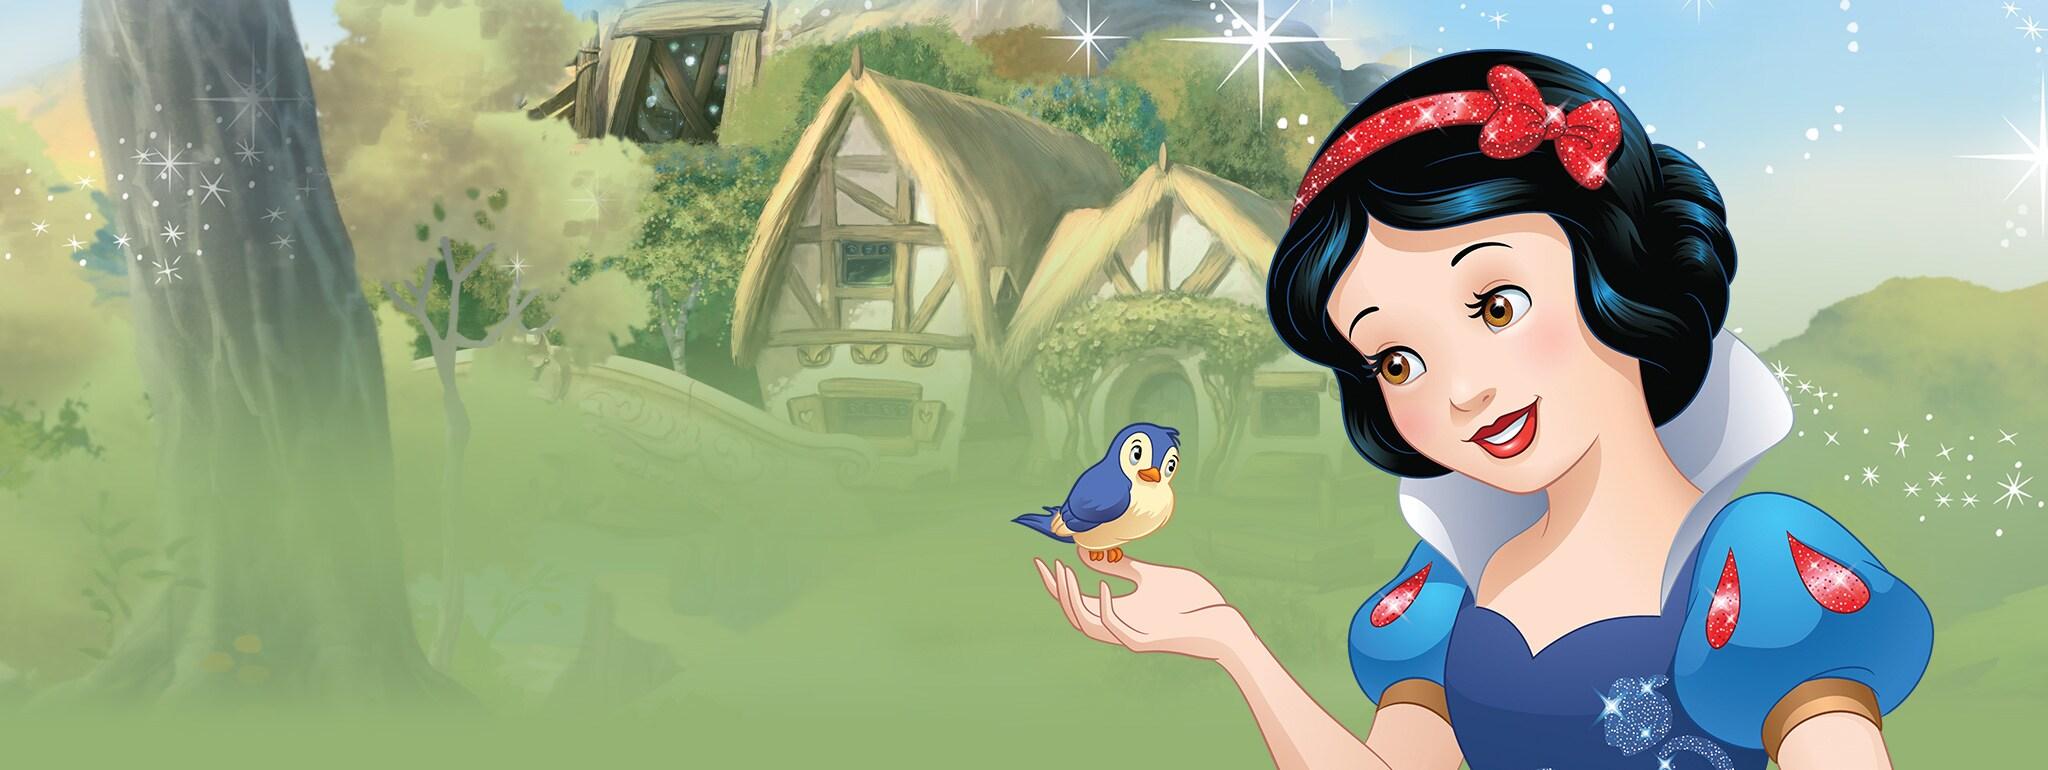 snow white games videos activities disney princess uk - Disney Princess Art And Activity Collection